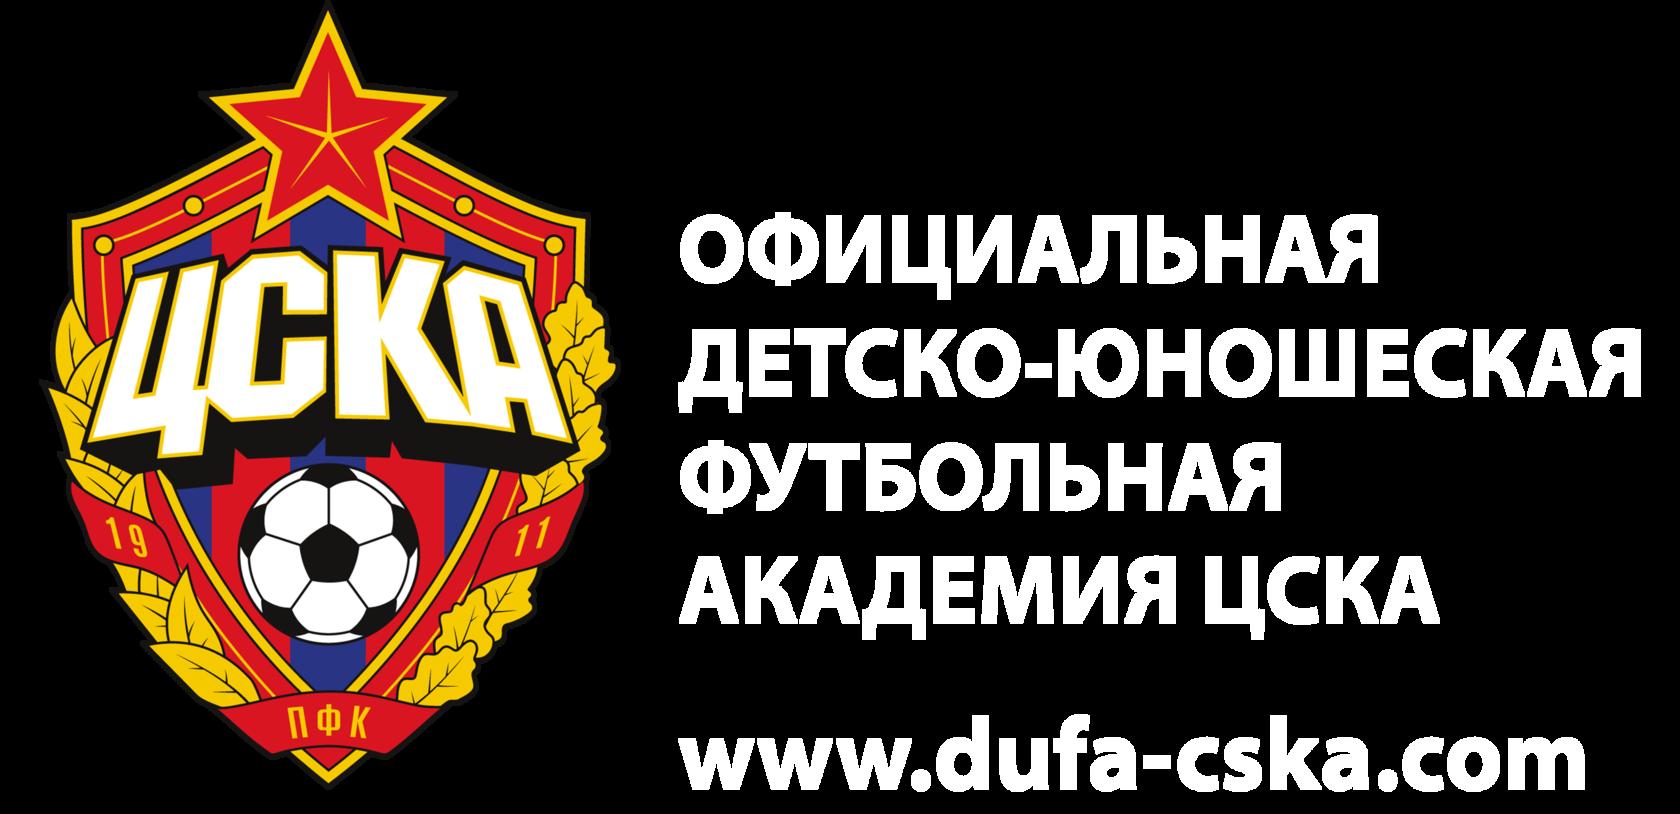 Официальная академия